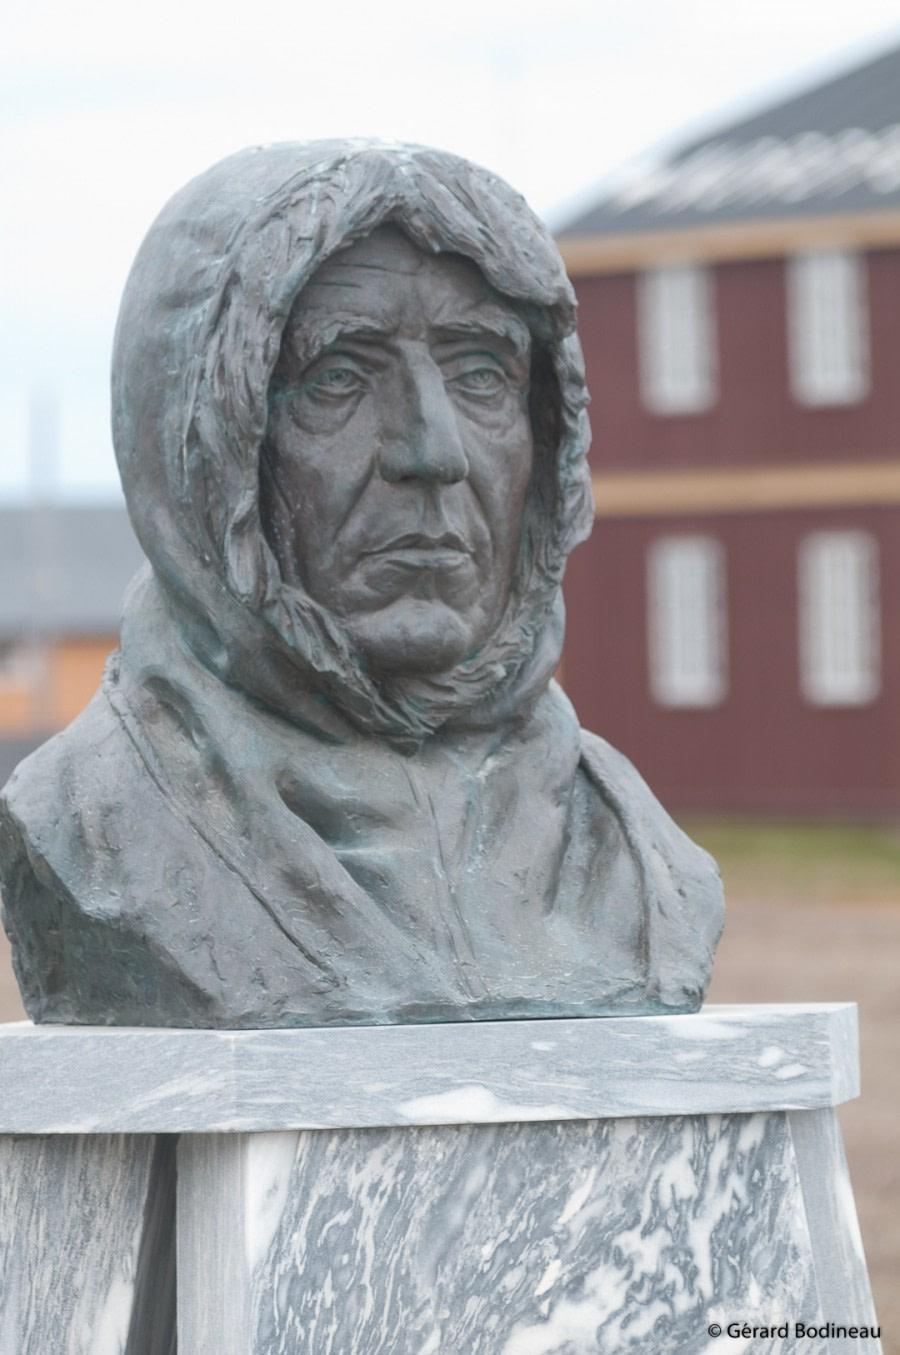 PLA15-19 DAY 06, 2019-08-31_AmundsenBust_GerardBodineau- Oceanwide Expeditions.jpg